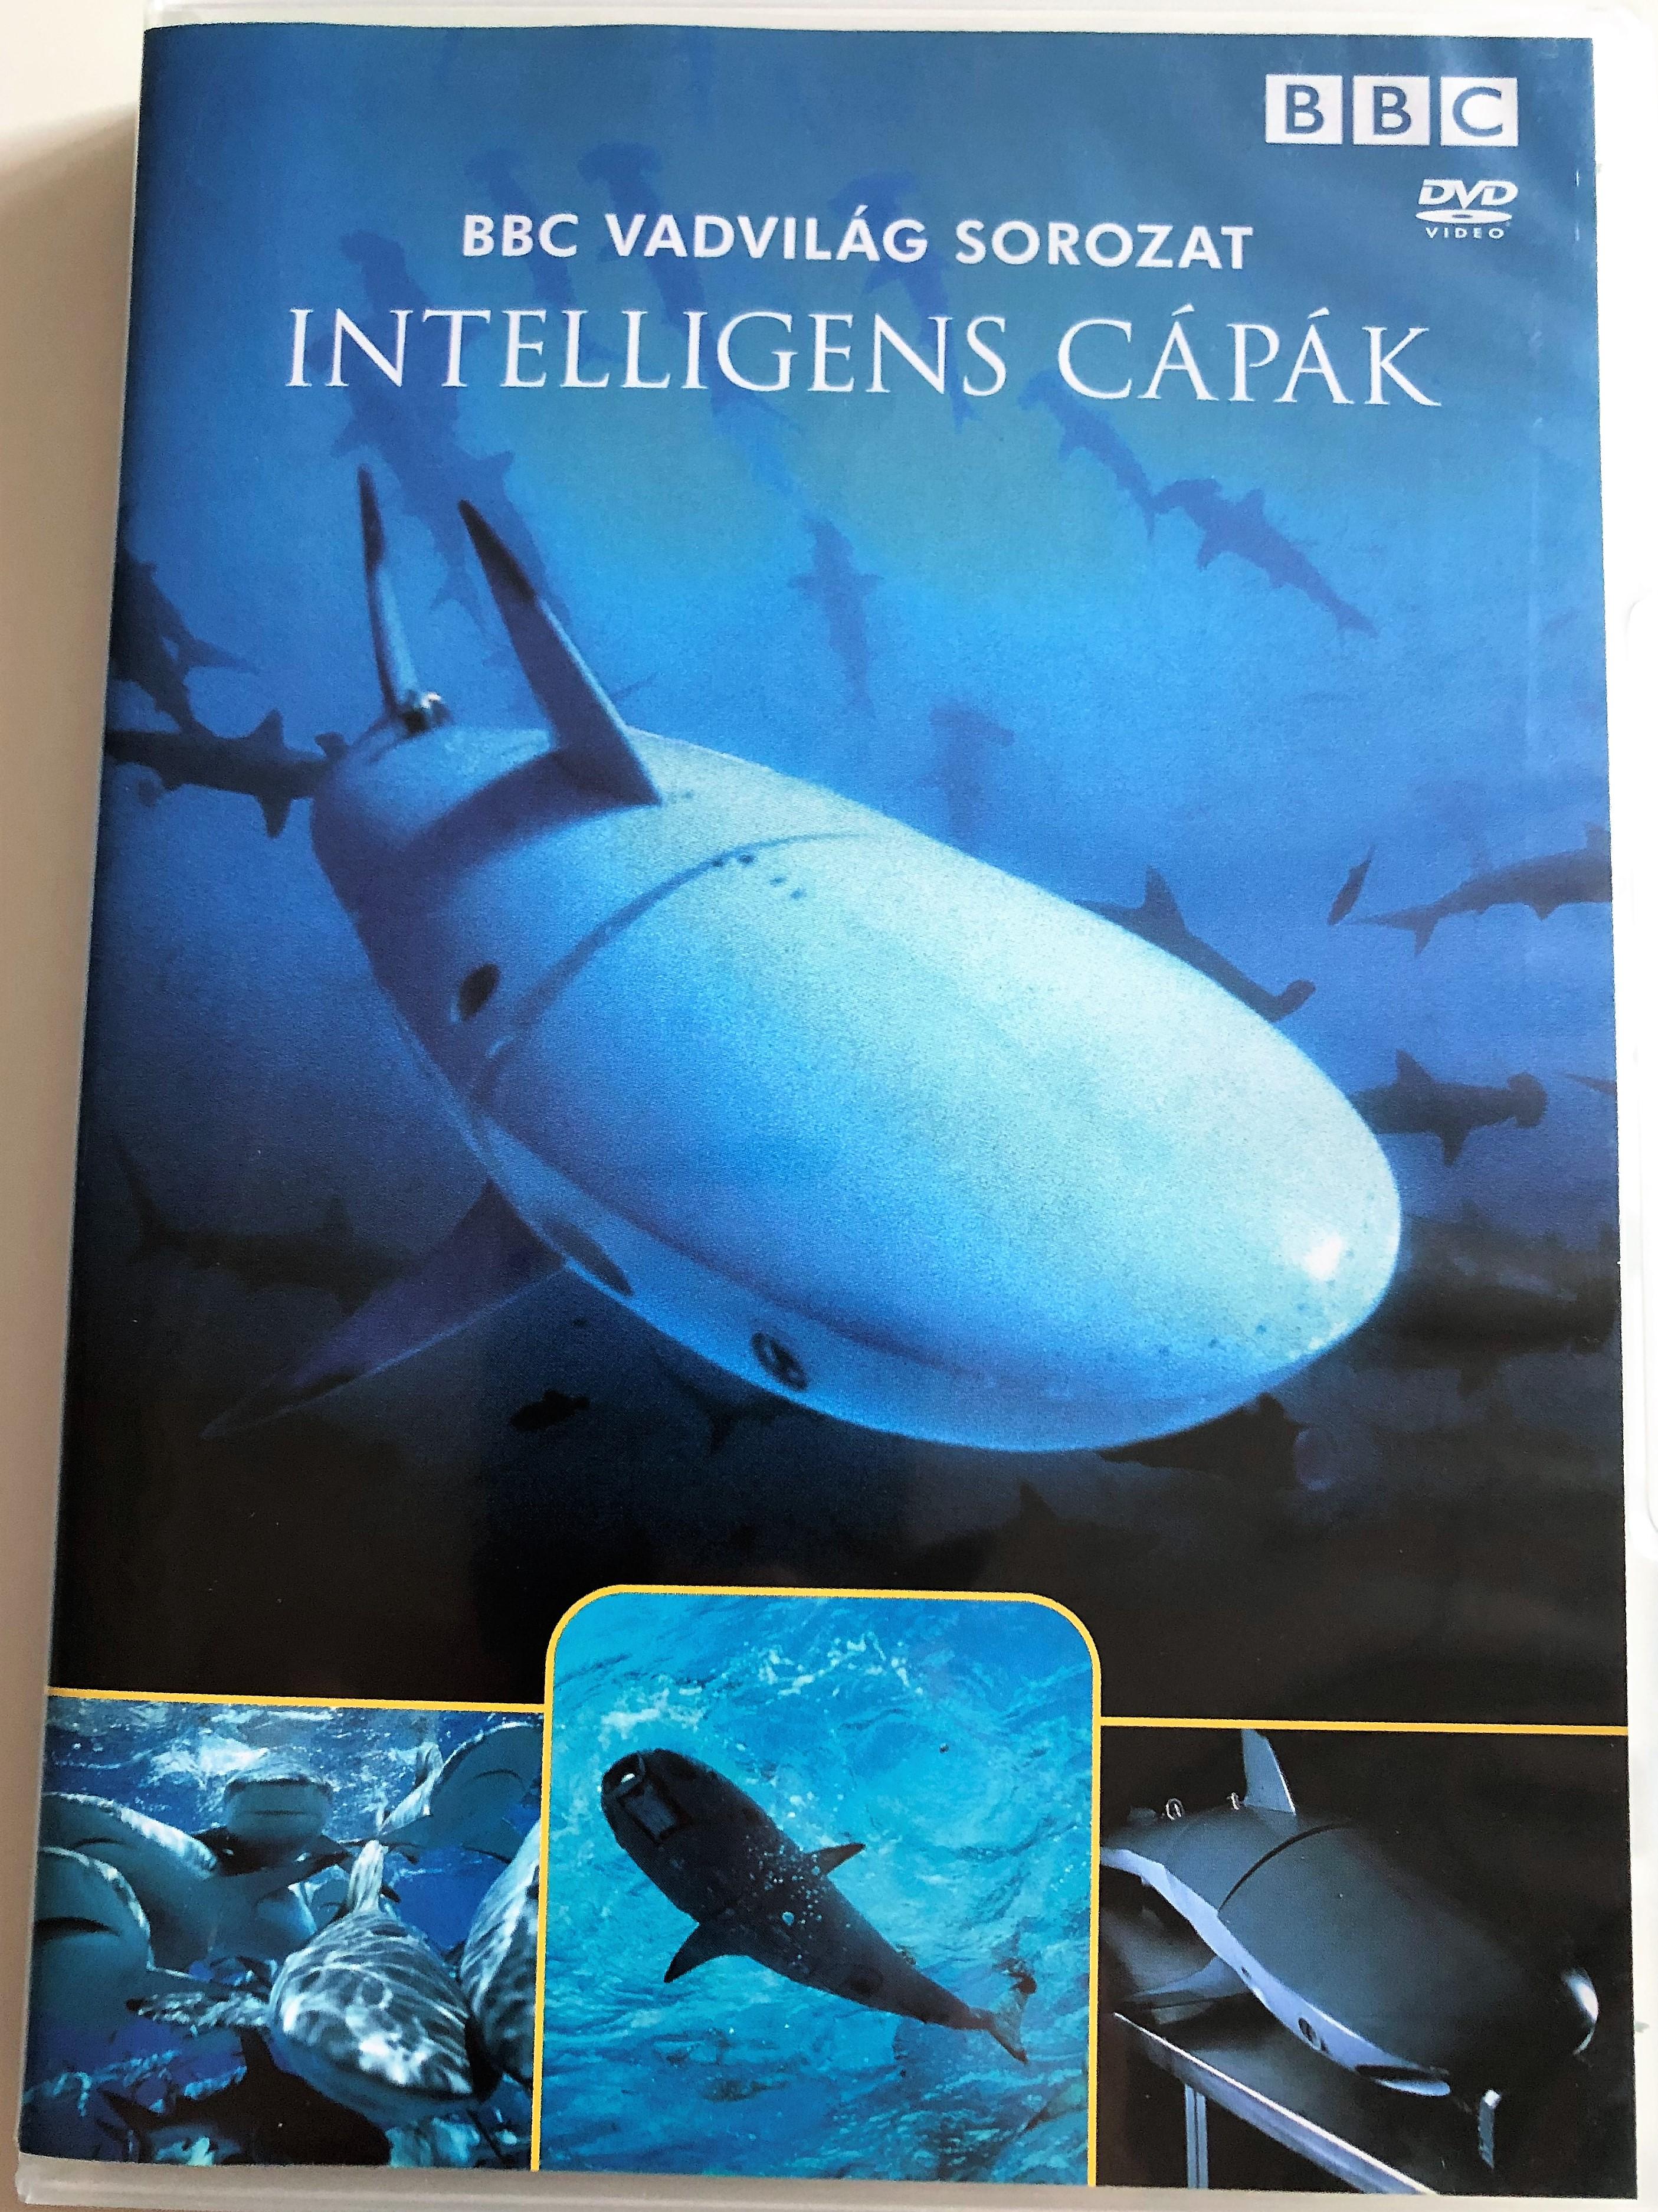 intelligens-c-p-k-smart-sharks-swimming-with-roboshark-bbc-wildlife-series-narrated-by-sir-david-attenborough-dvd-2003-bbc-vadvil-g-sorozat-1-.jpg